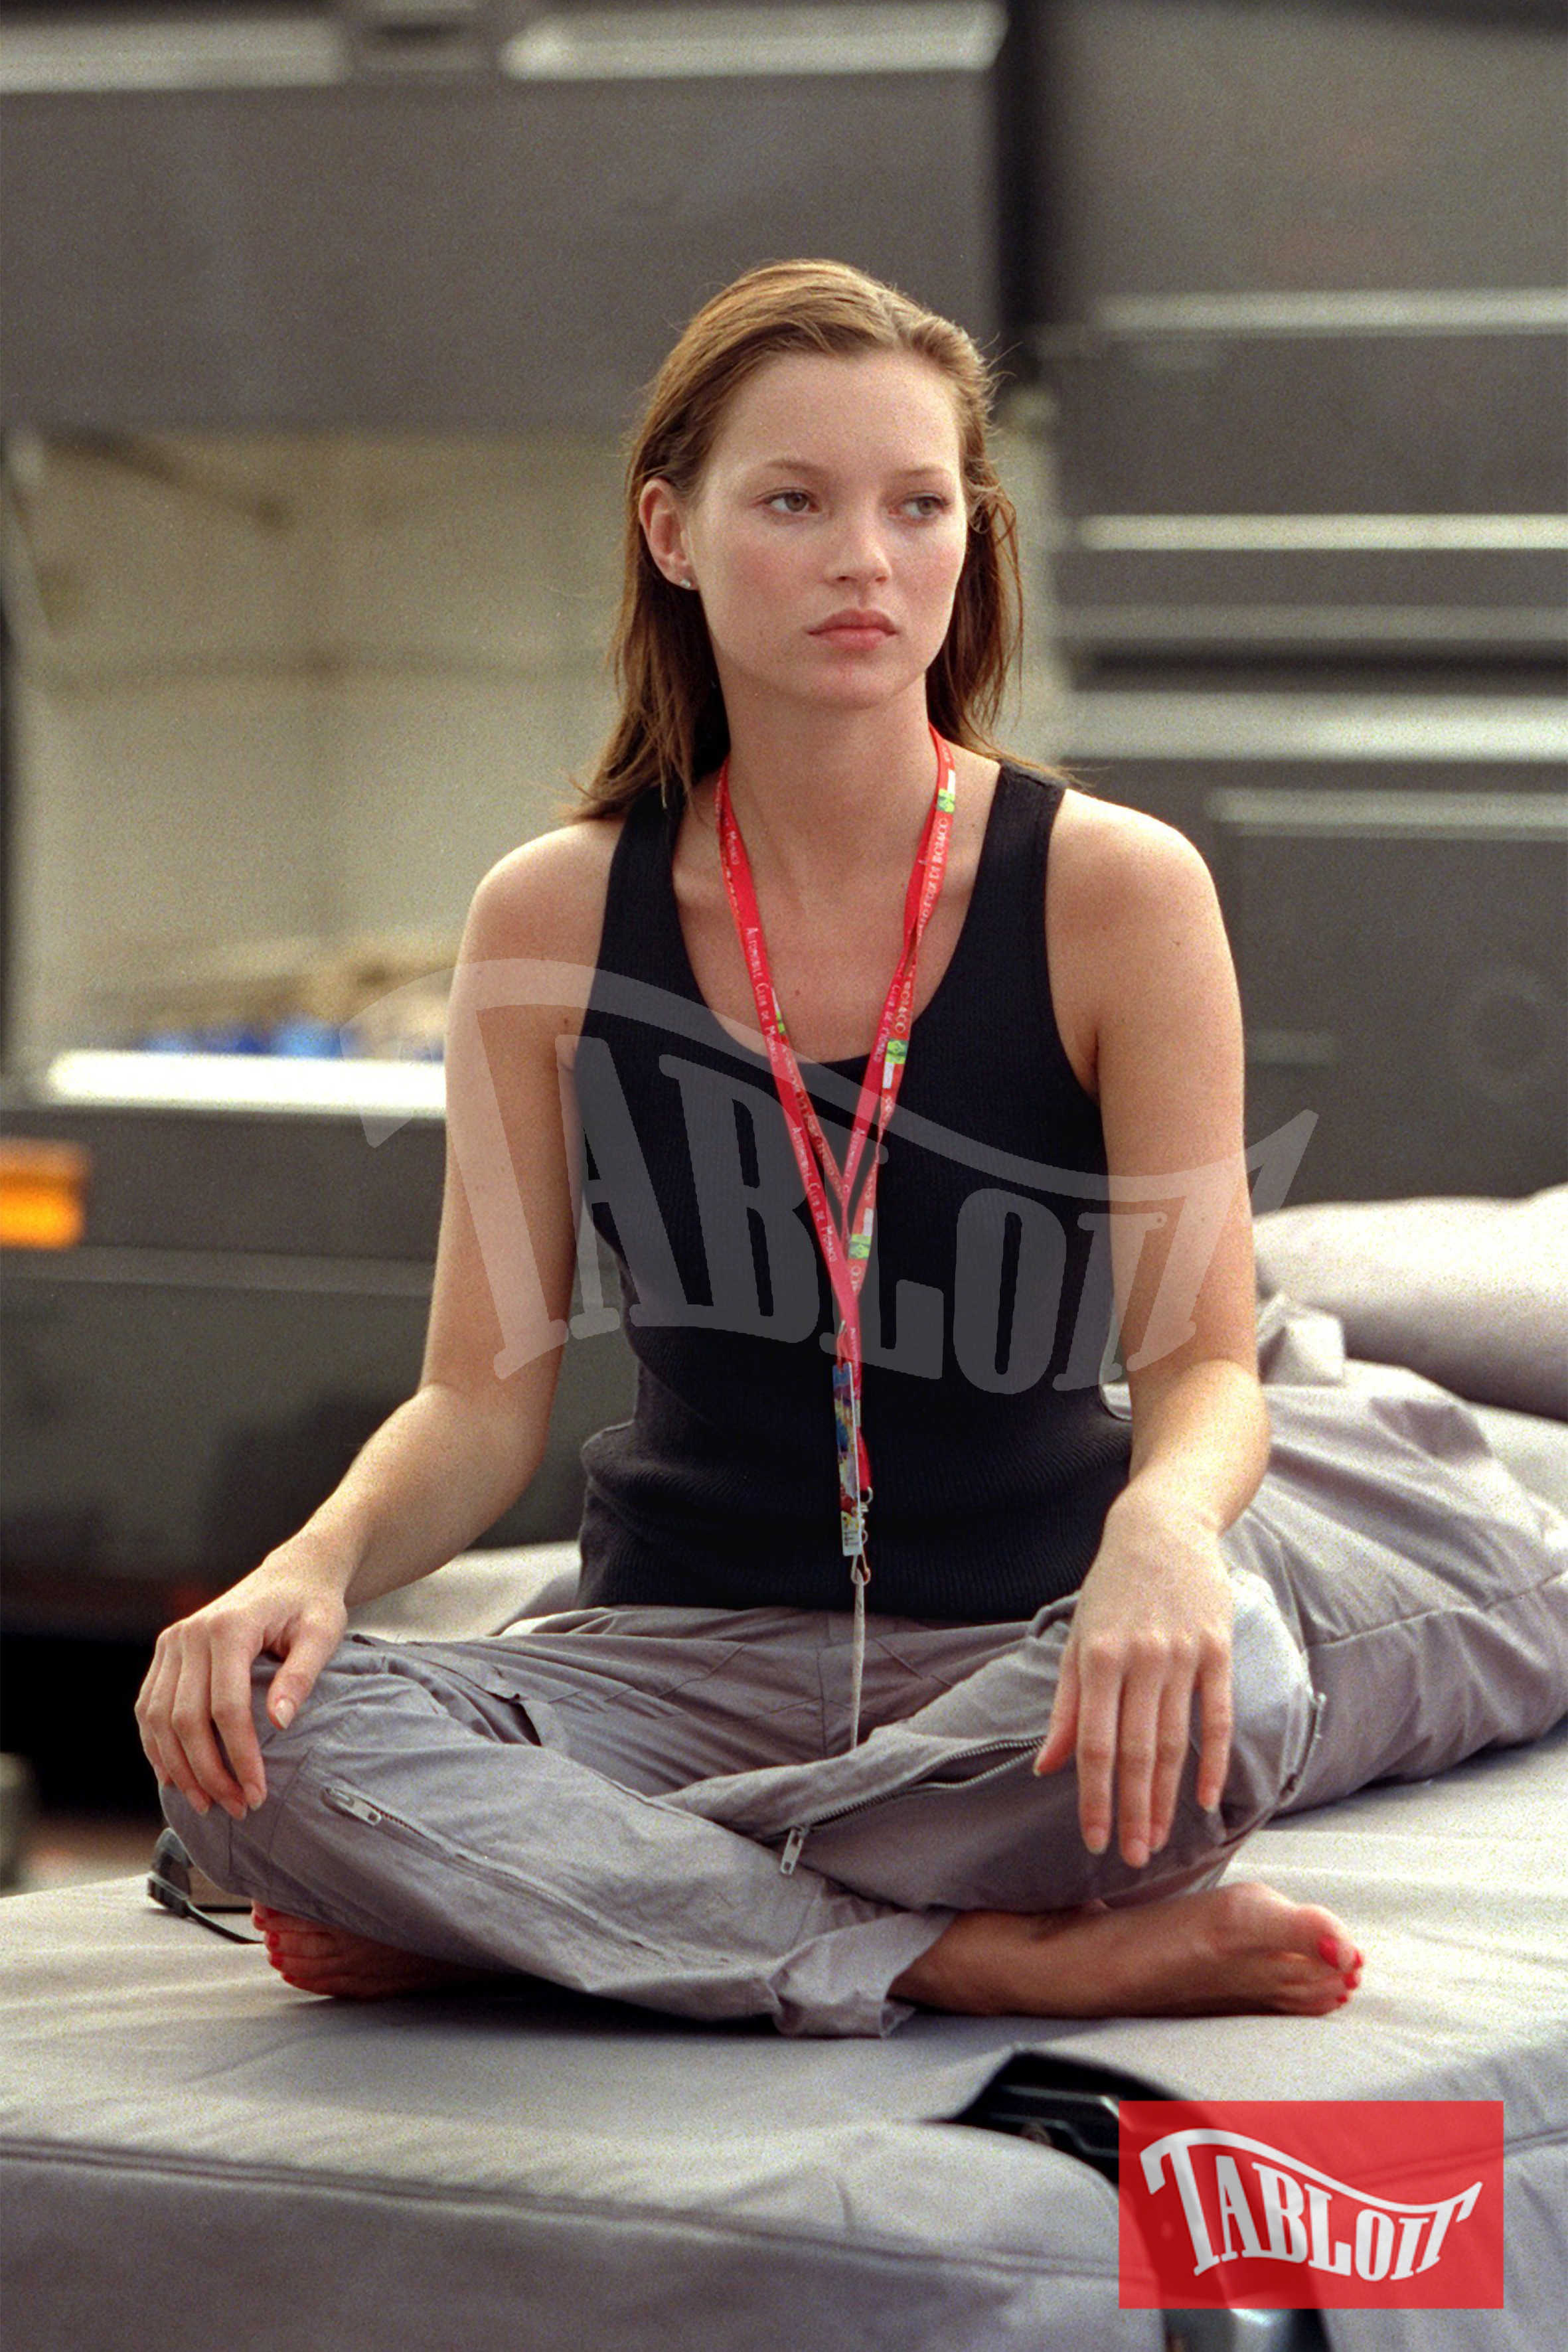 Kate Moss nel 1999 a 25 anni